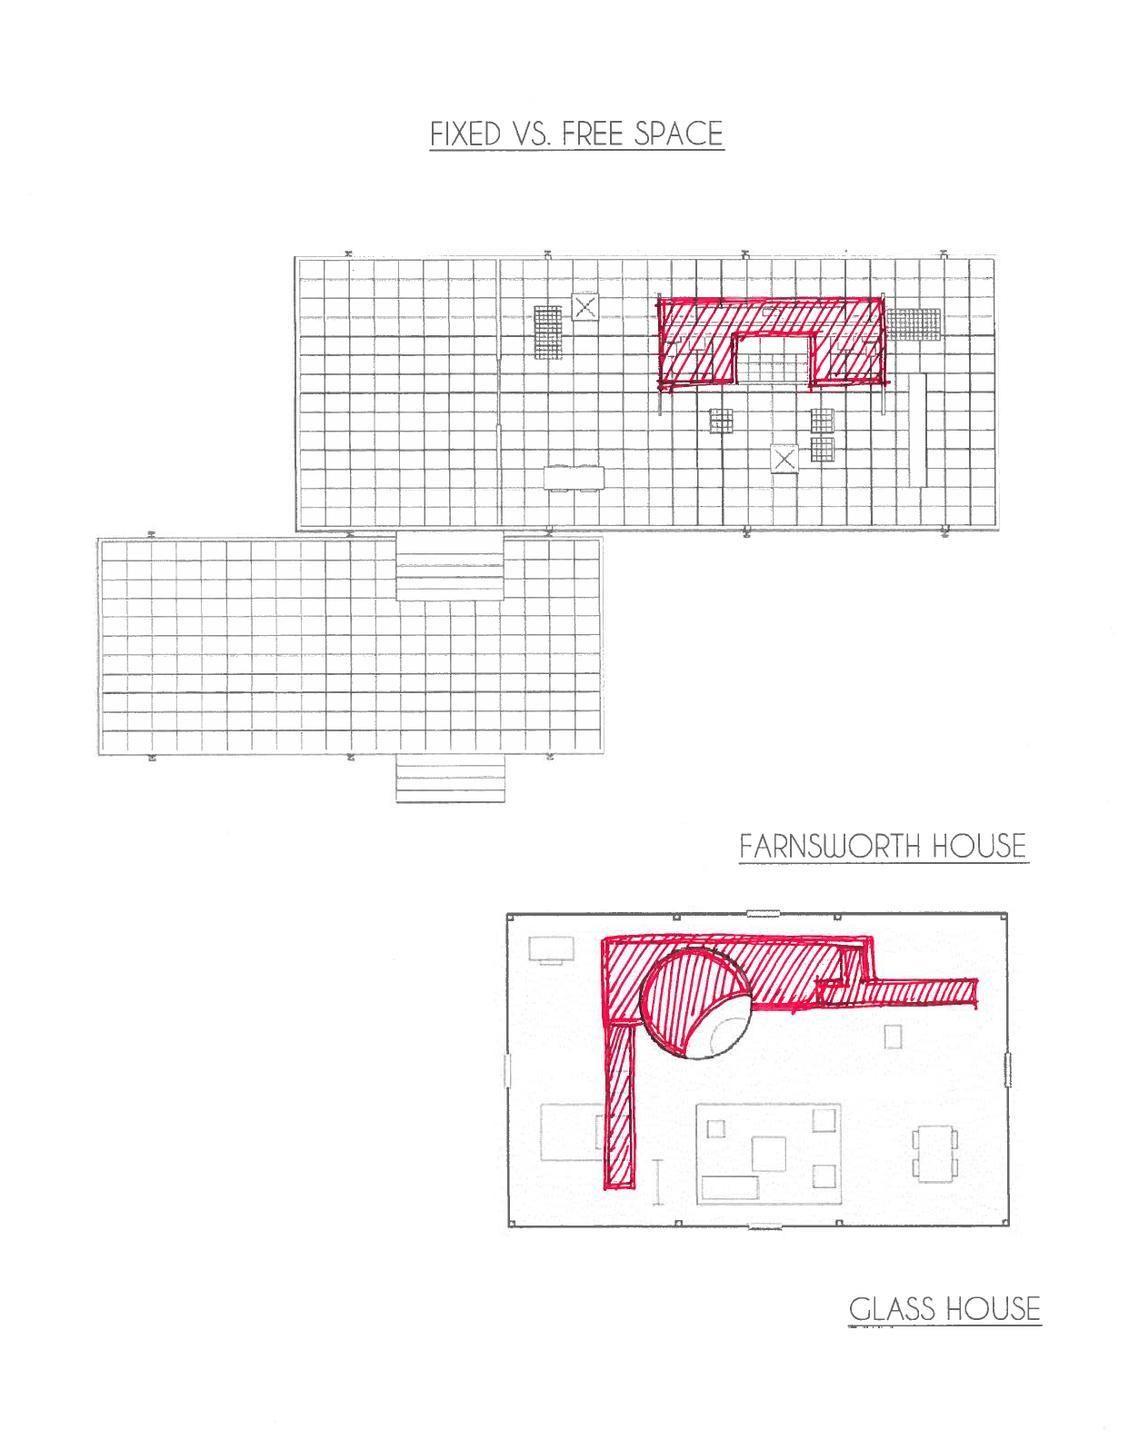 Case Study Analysis: Farnsworth House & The Glass House